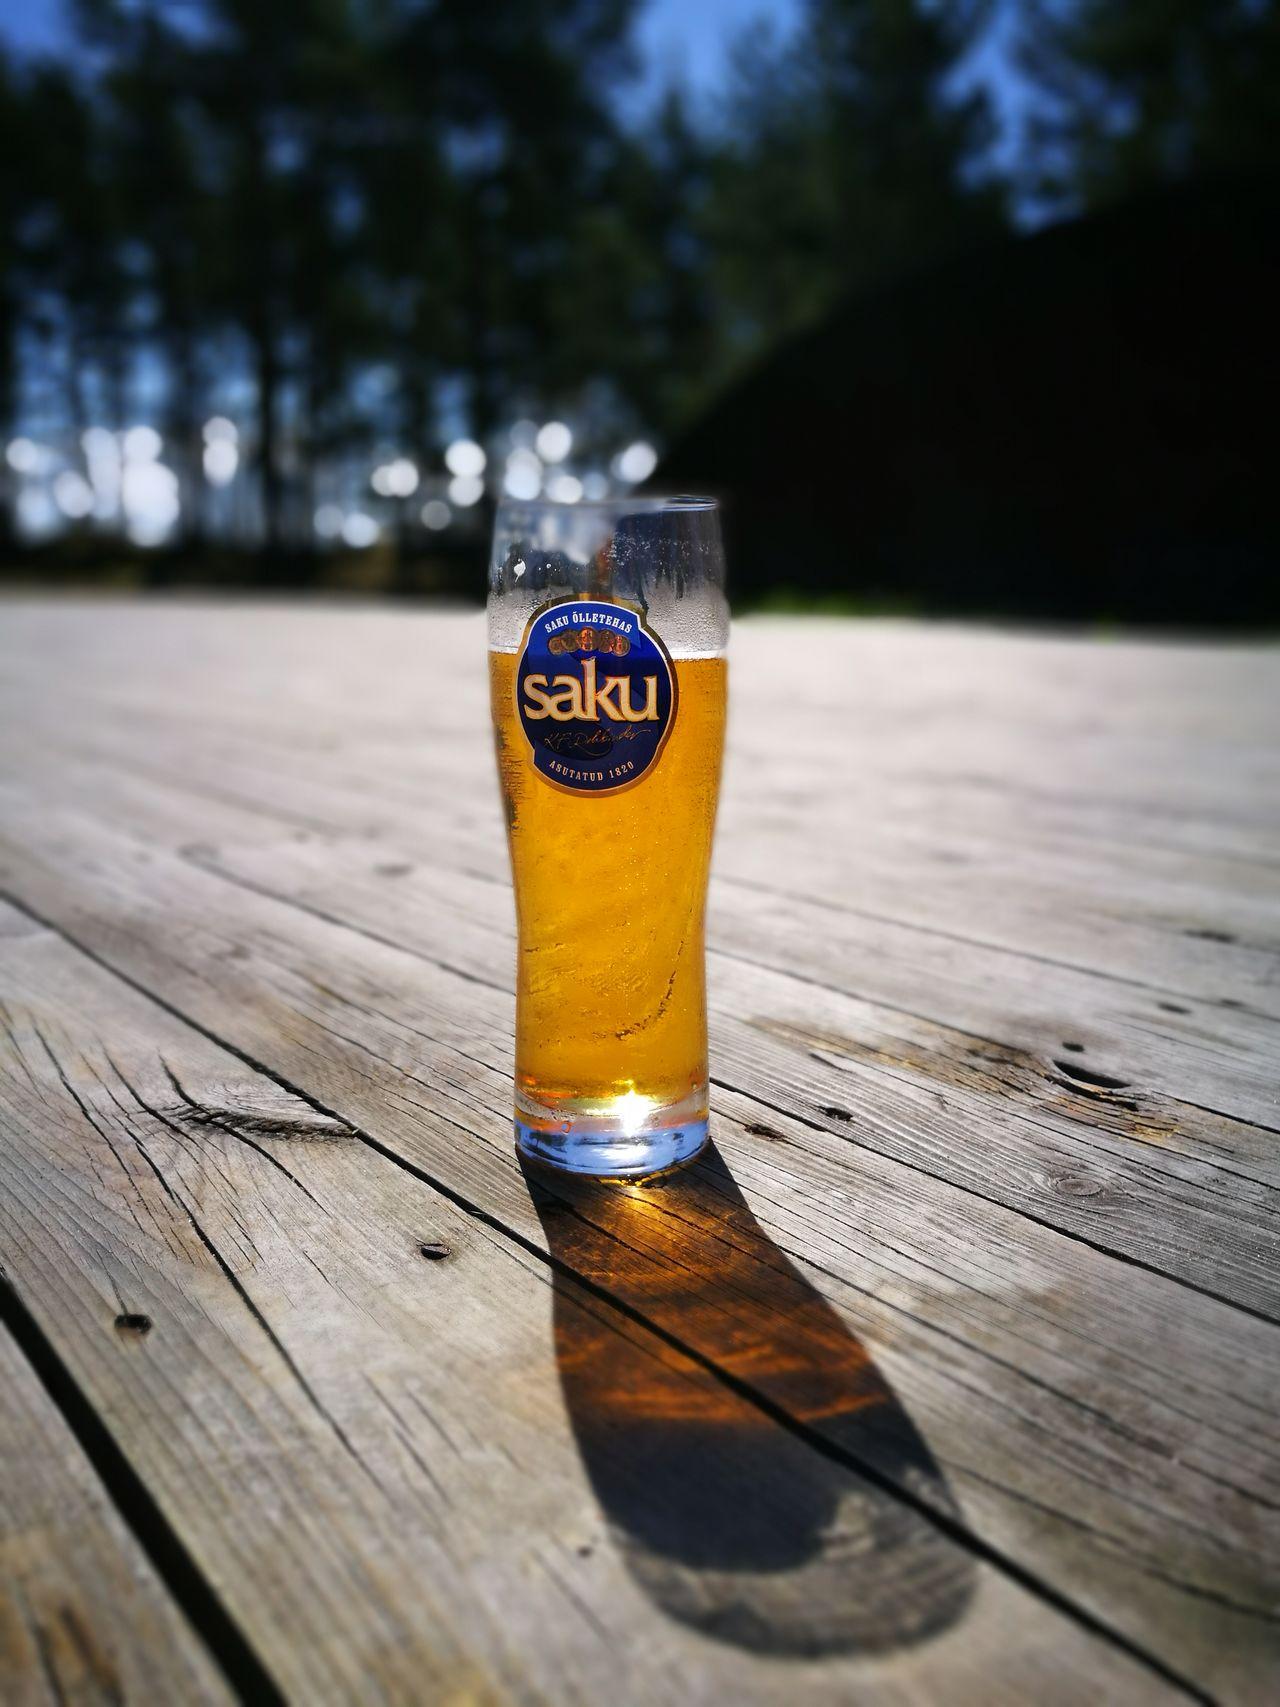 Coldbeer Hanging Out Enjoying Life Island Summer Getaway  Prangli Island Refreshment Beer O'clock Beer Glass Beerlover Saku SakuKuld